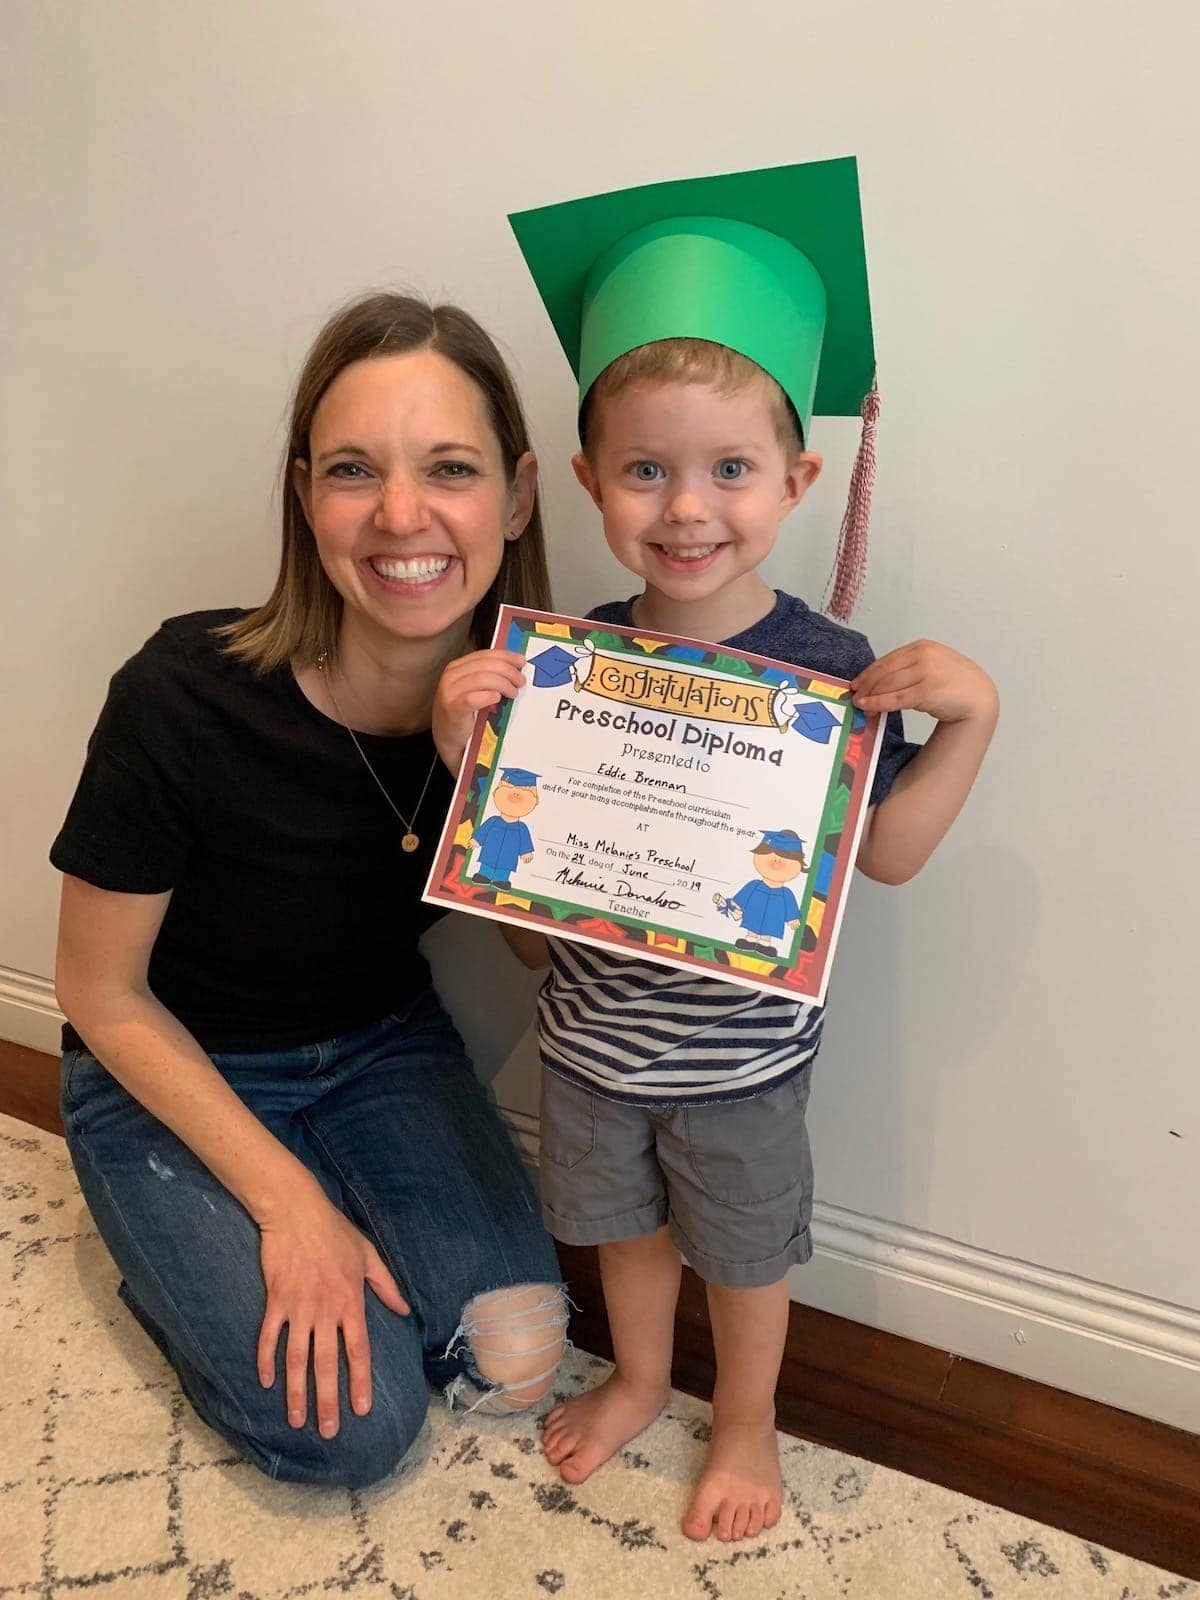 Eddie with his teacher holding a preschool diploma